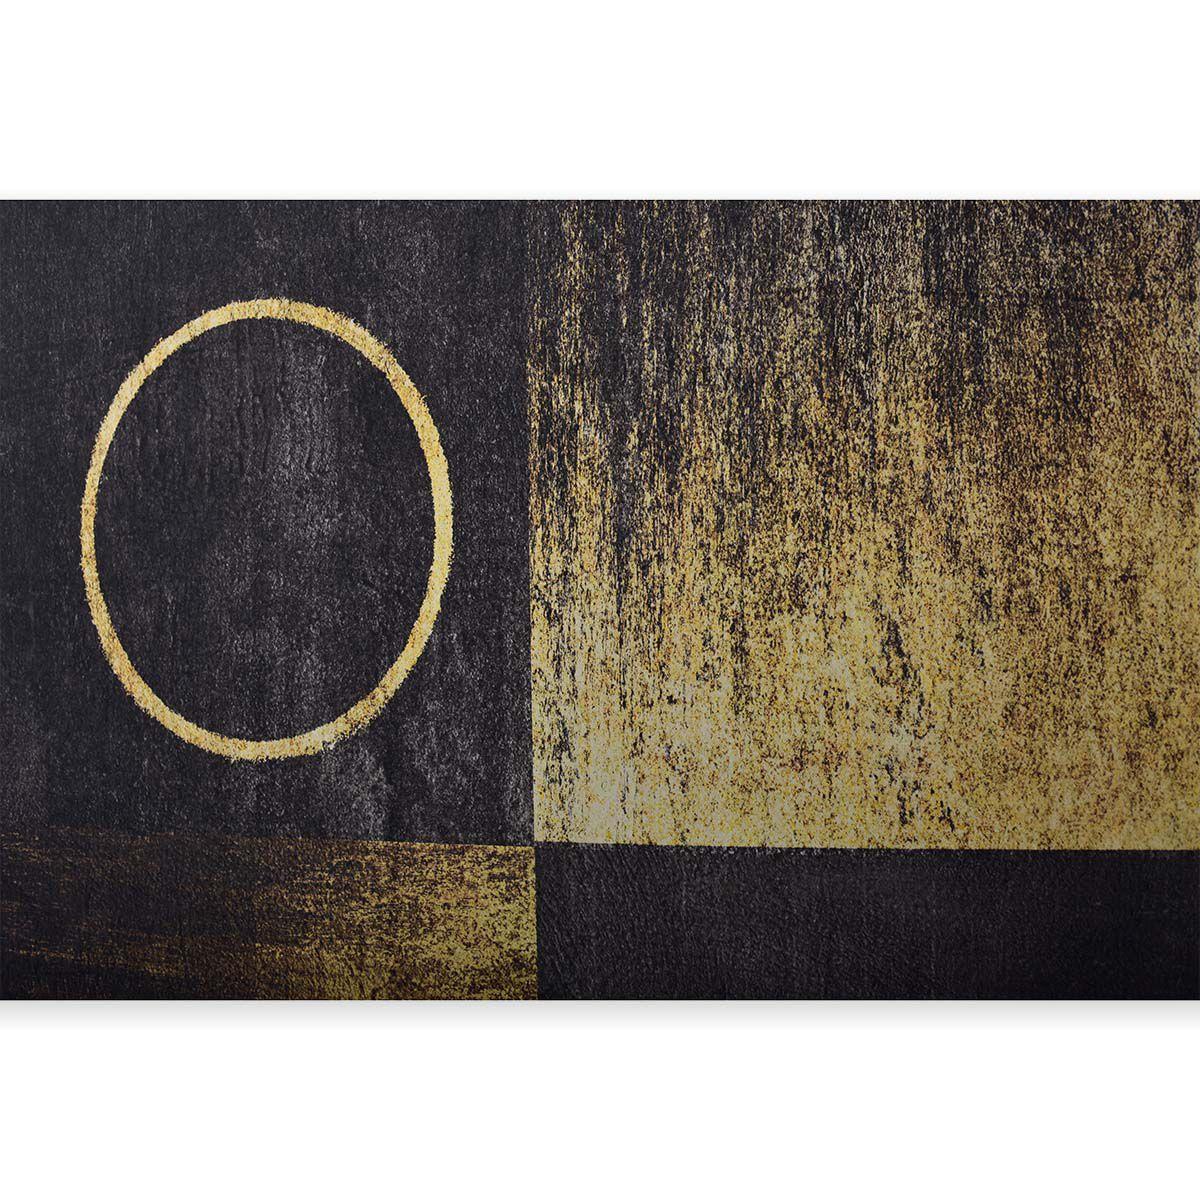 Quadro Decor Abstrato Esquadro Dourado